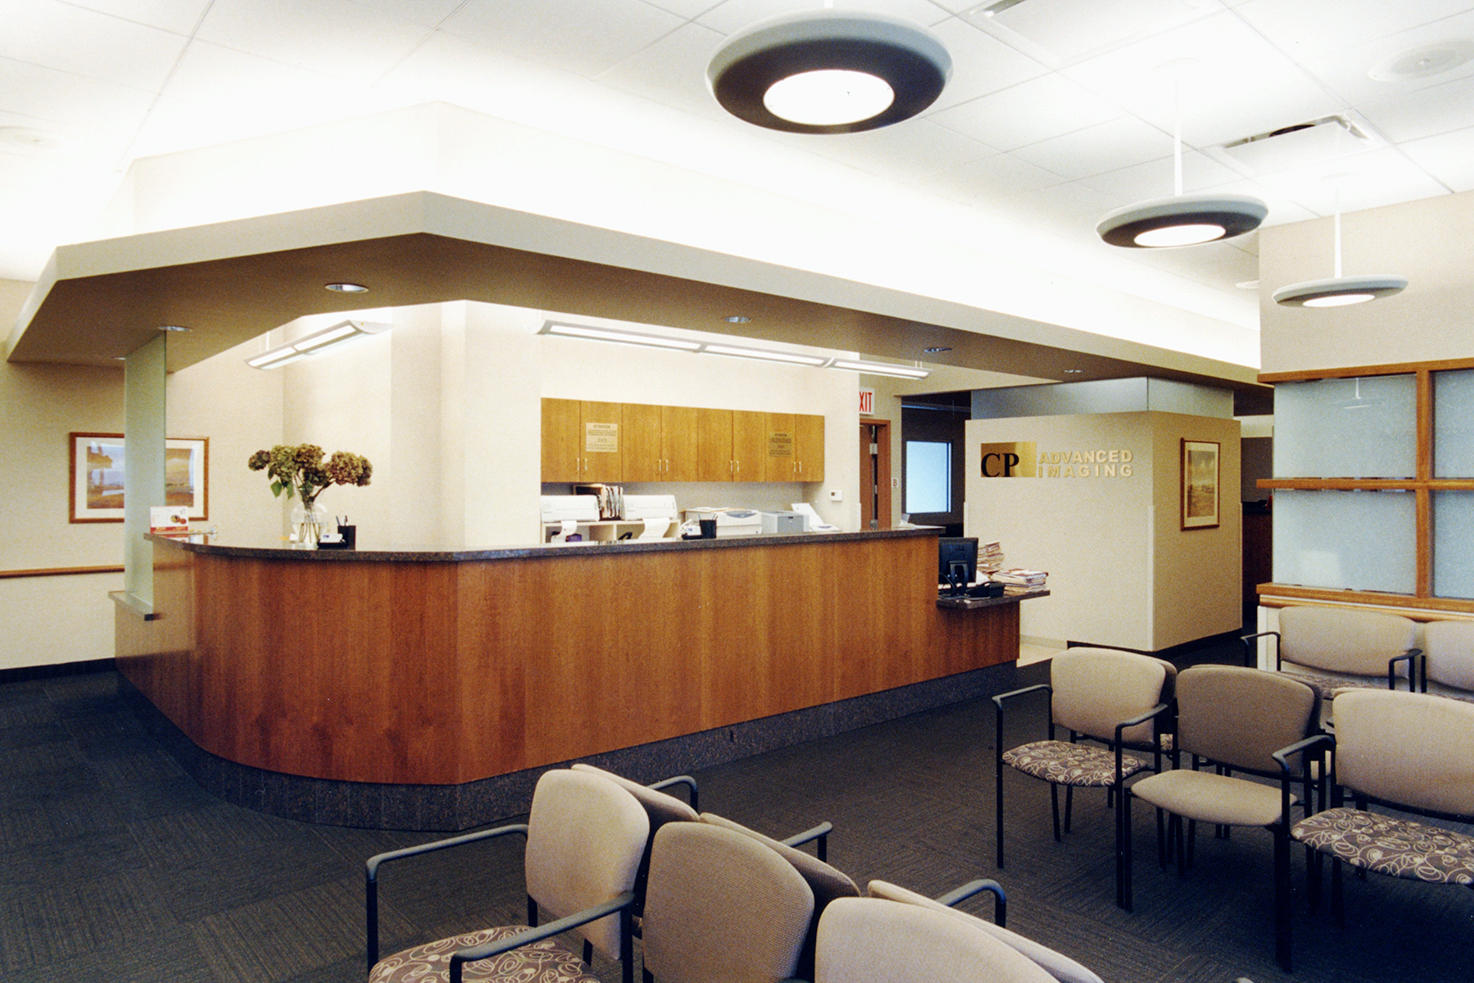 CP Radiology Reception #4.JPG